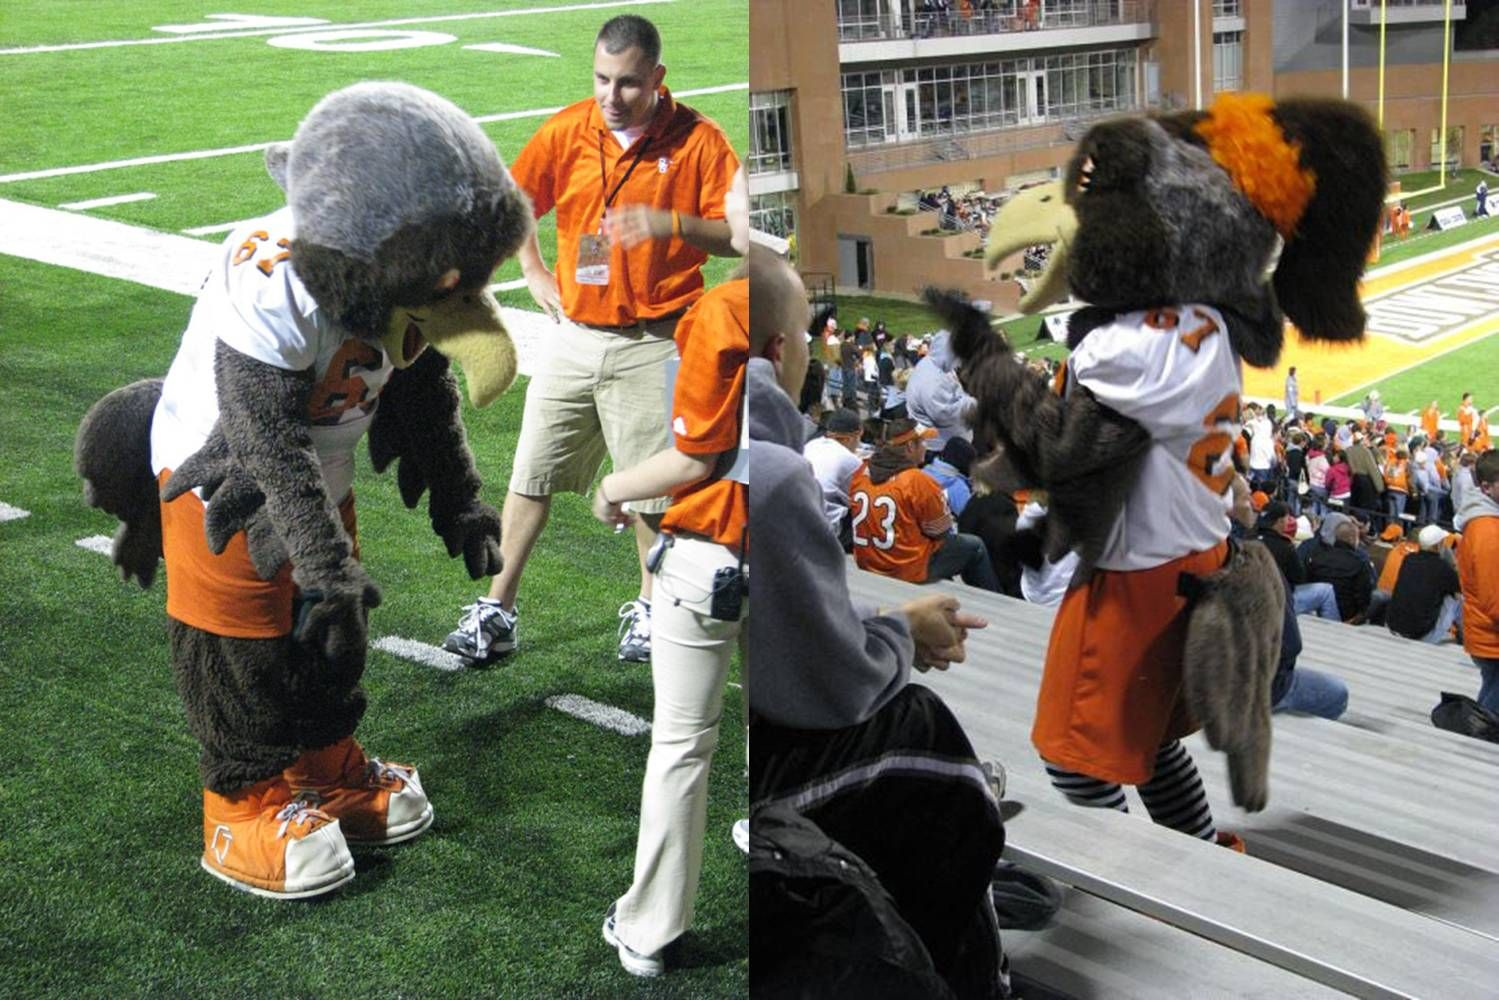 Pin By Unisunn 144 College Football B On Bowling Green State University Falcons Bowling Green State University College Football Mascot